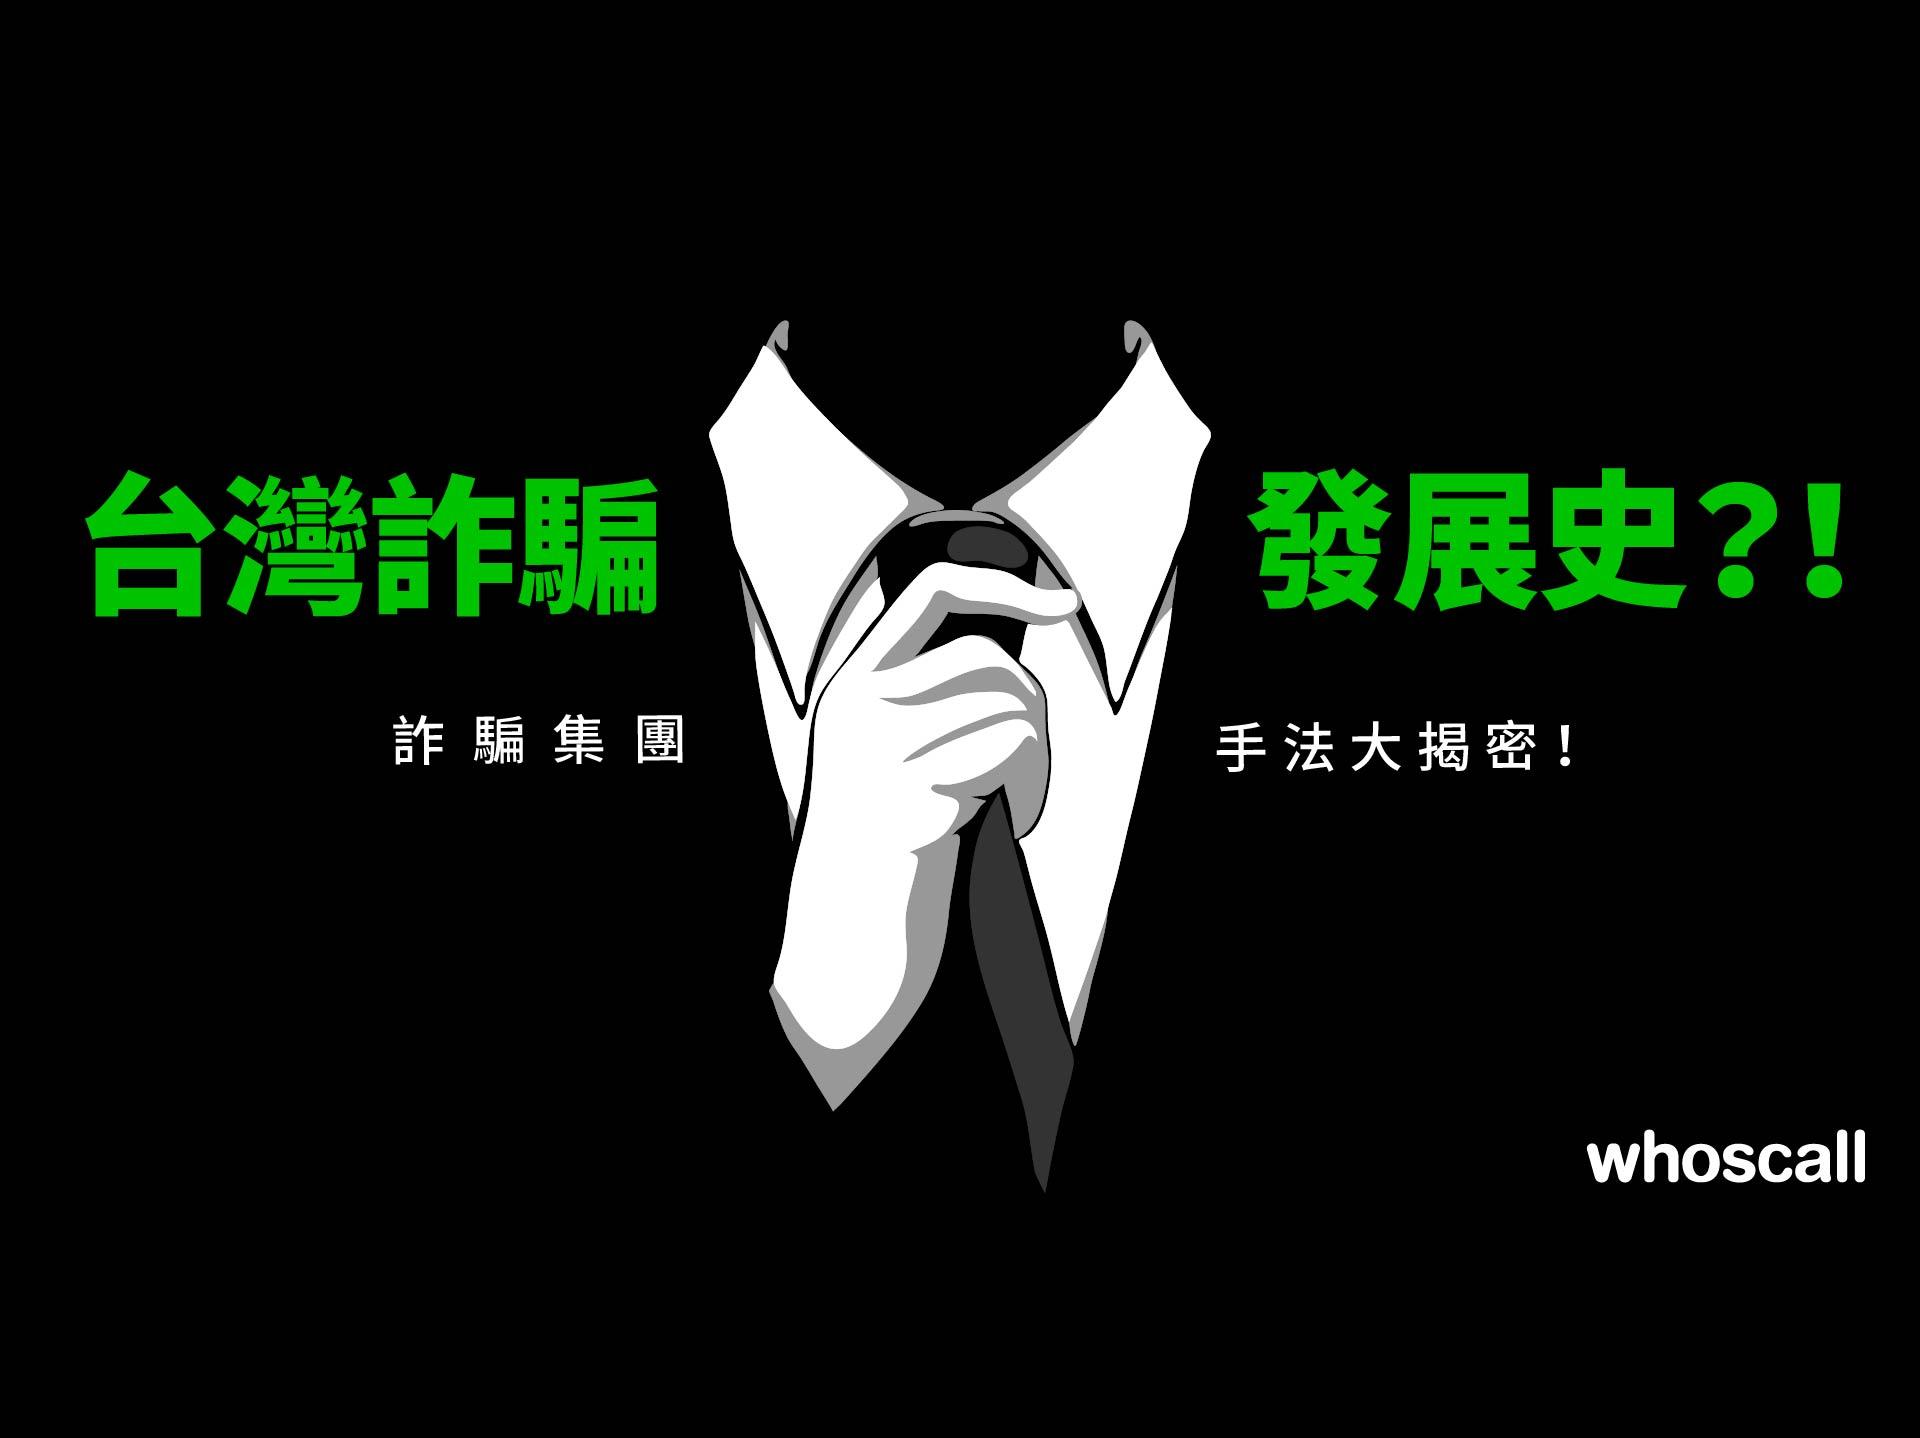 Whoscall 解密詐騙集團在台發跡歷史!防詐 3 大要點這樣做